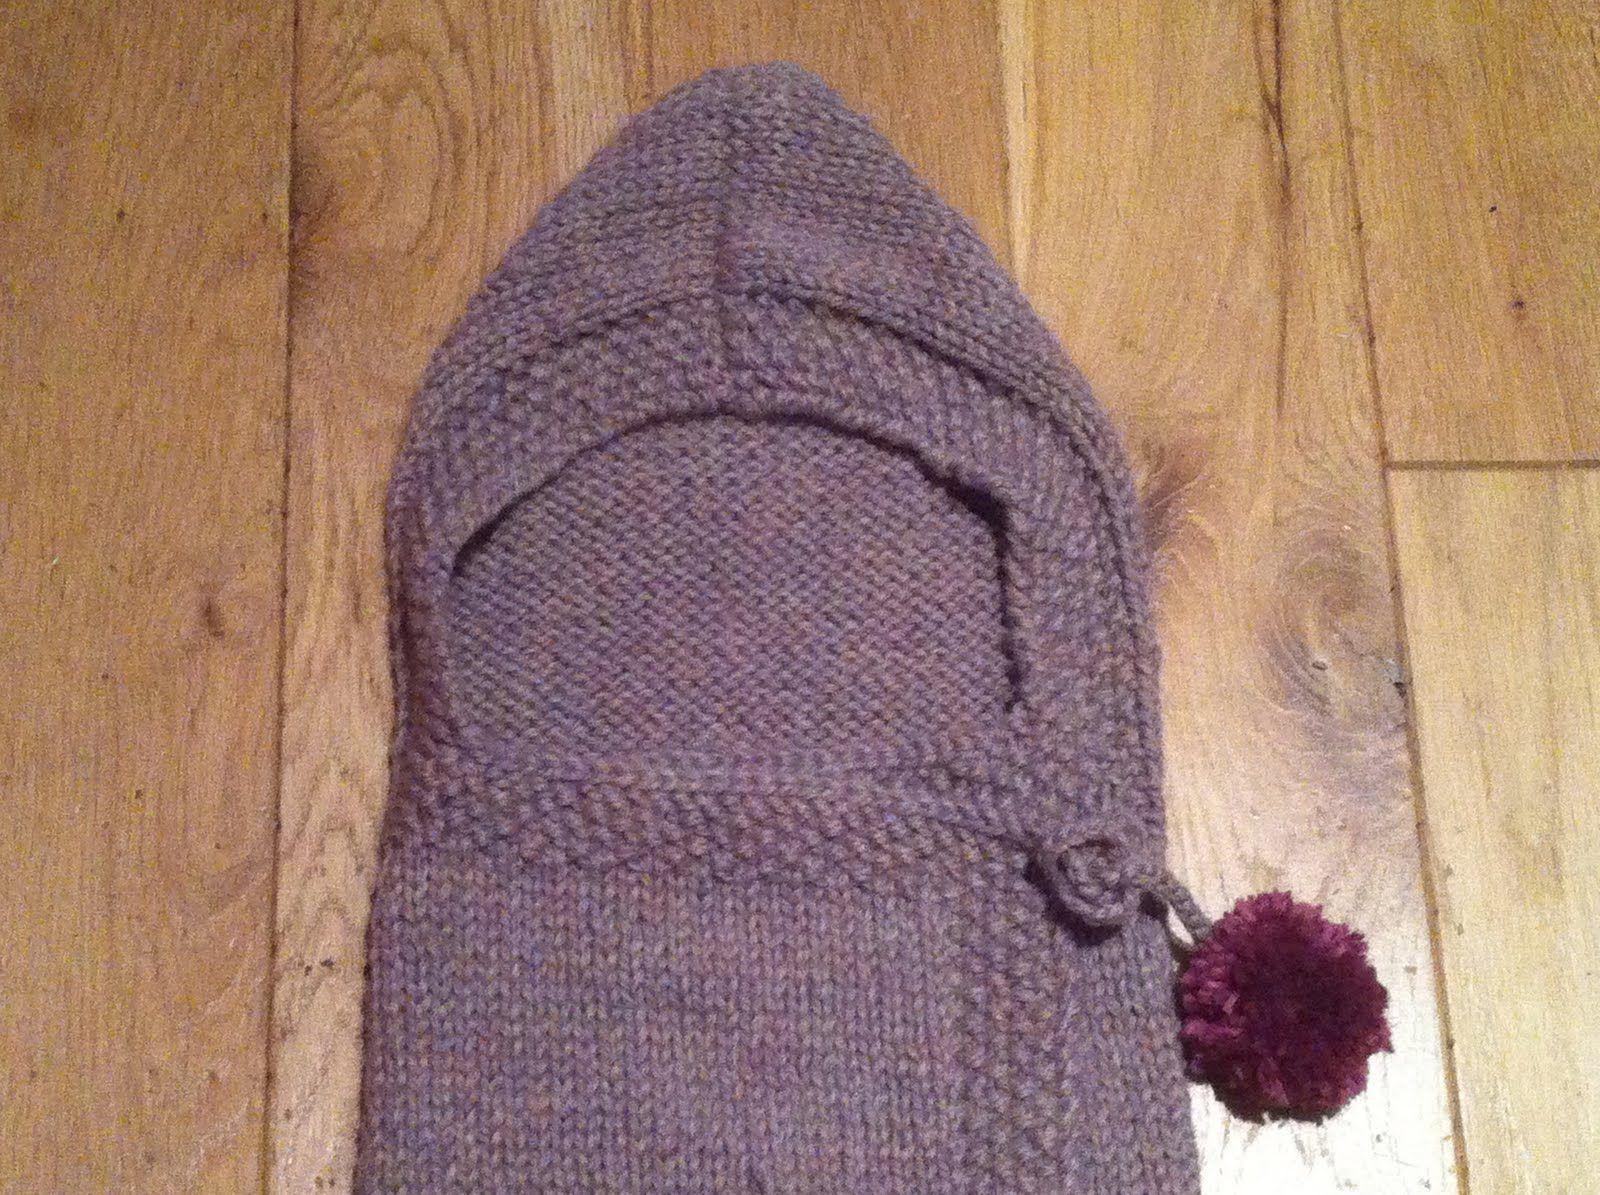 Stitch me softly baby snuggle wrap knitting pattern knit baby snuggle wrap knitting pattern bankloansurffo Images